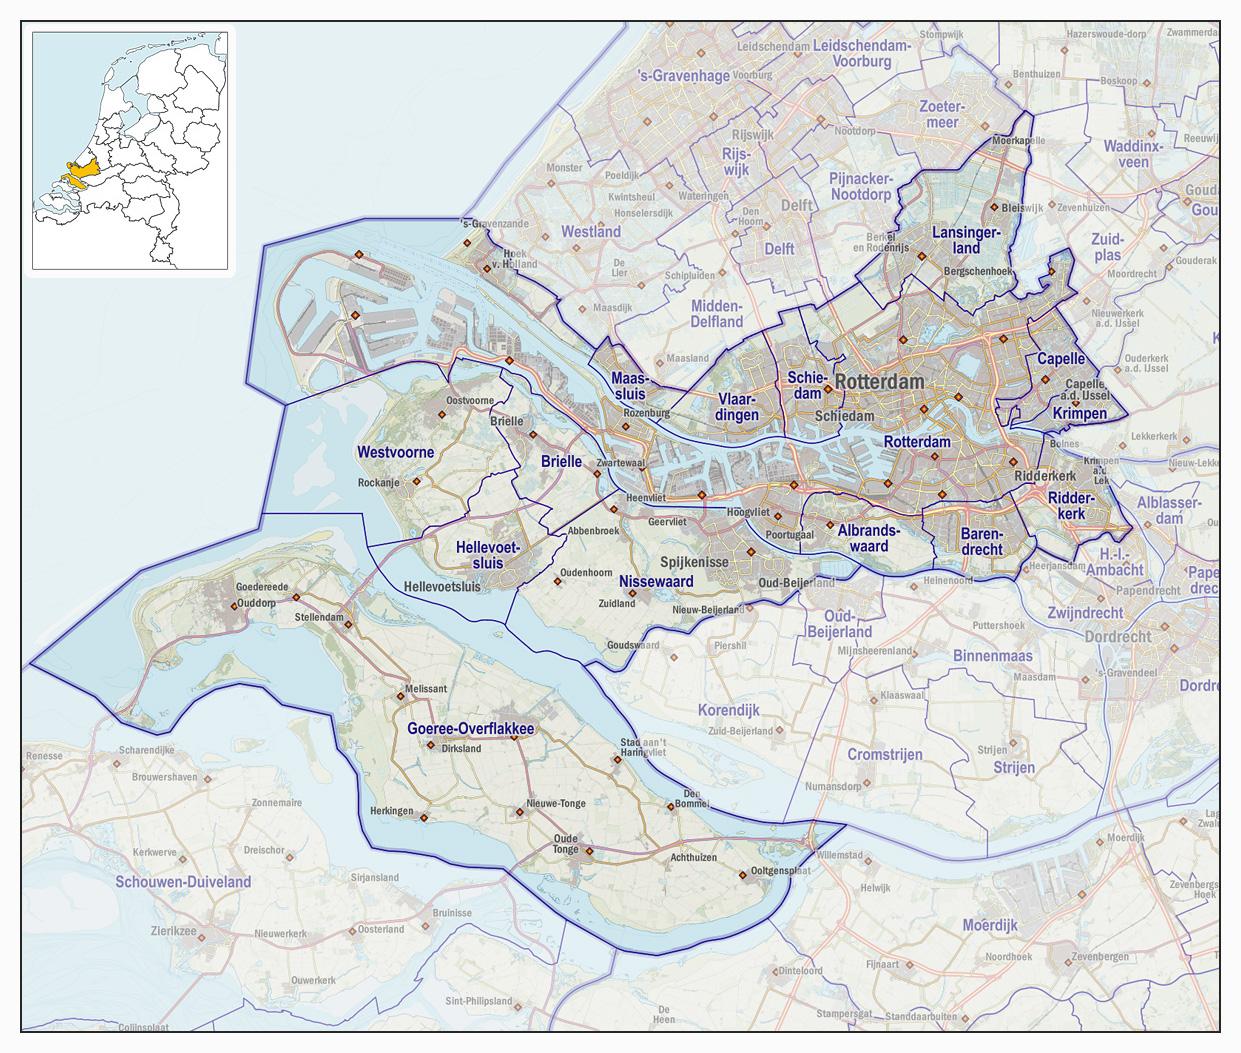 Veiligheidsregio Rotterdam Rijnmond Wikipedia